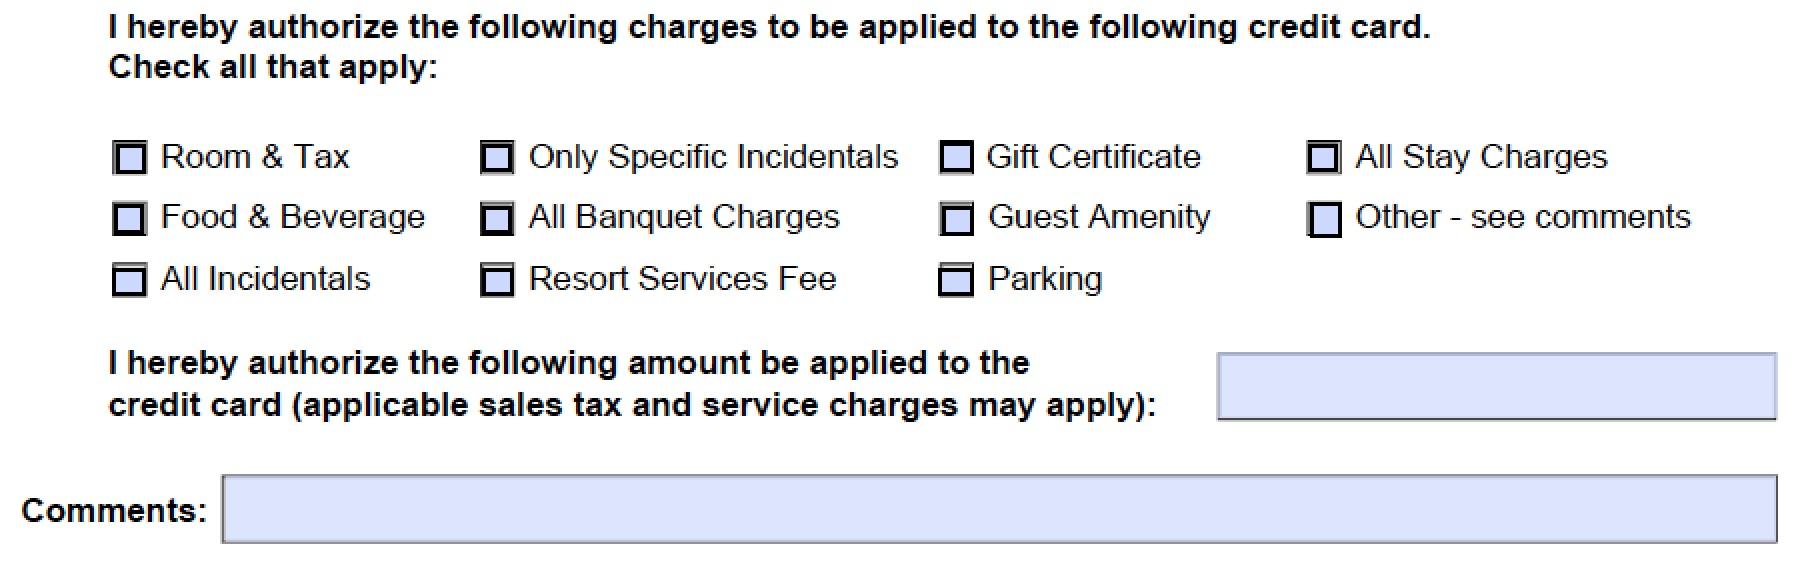 Hyatt-Credit-Card-Authorization-Form-Part-3